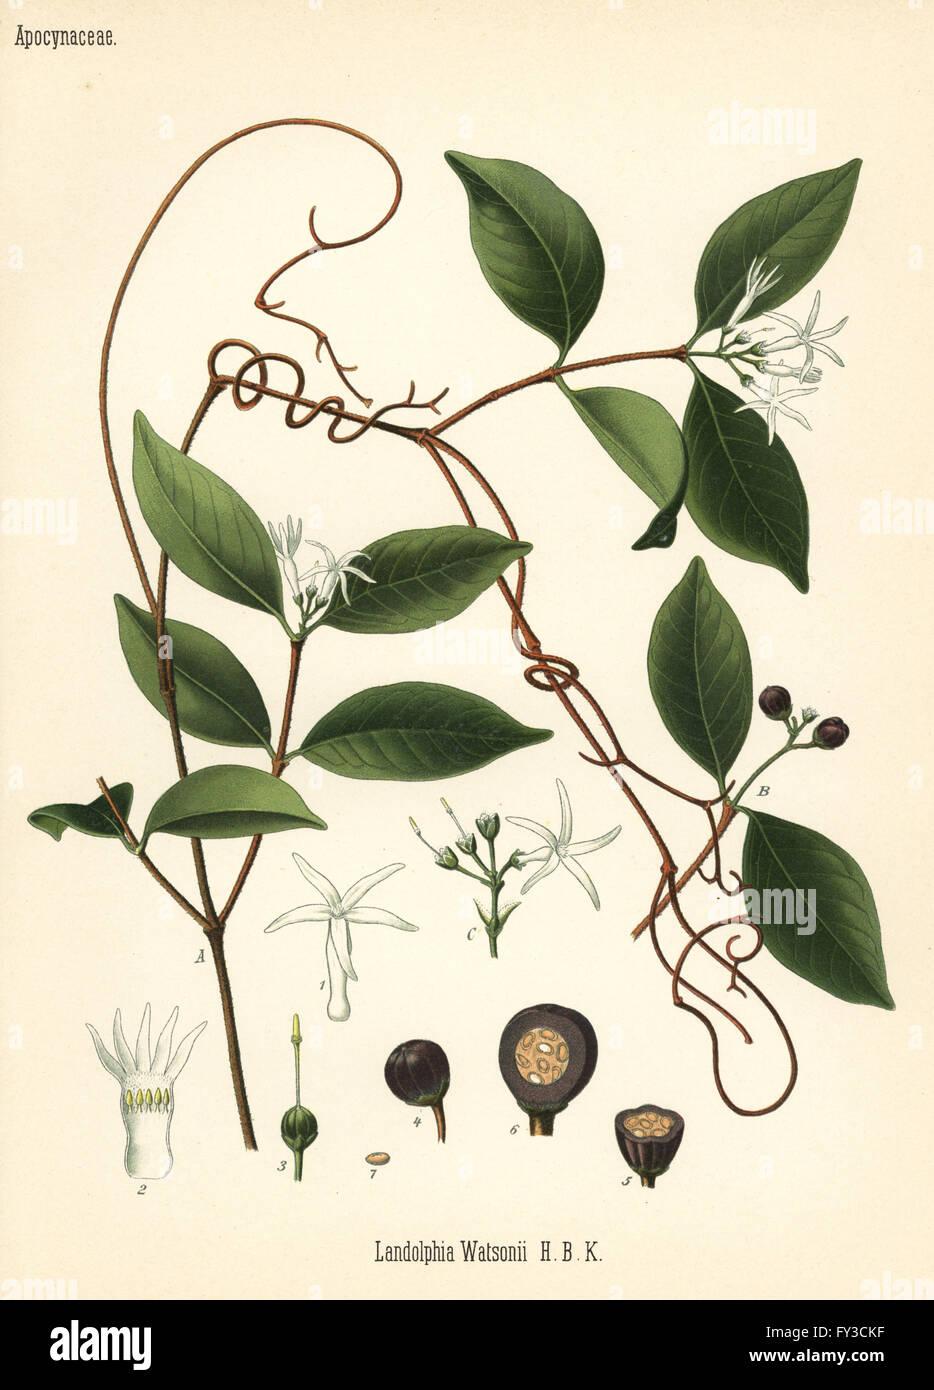 Watson's landolphia, Landolphia watsoniana (Landolphia watsonii). Chromolithograph after a botanical illustration - Stock Image